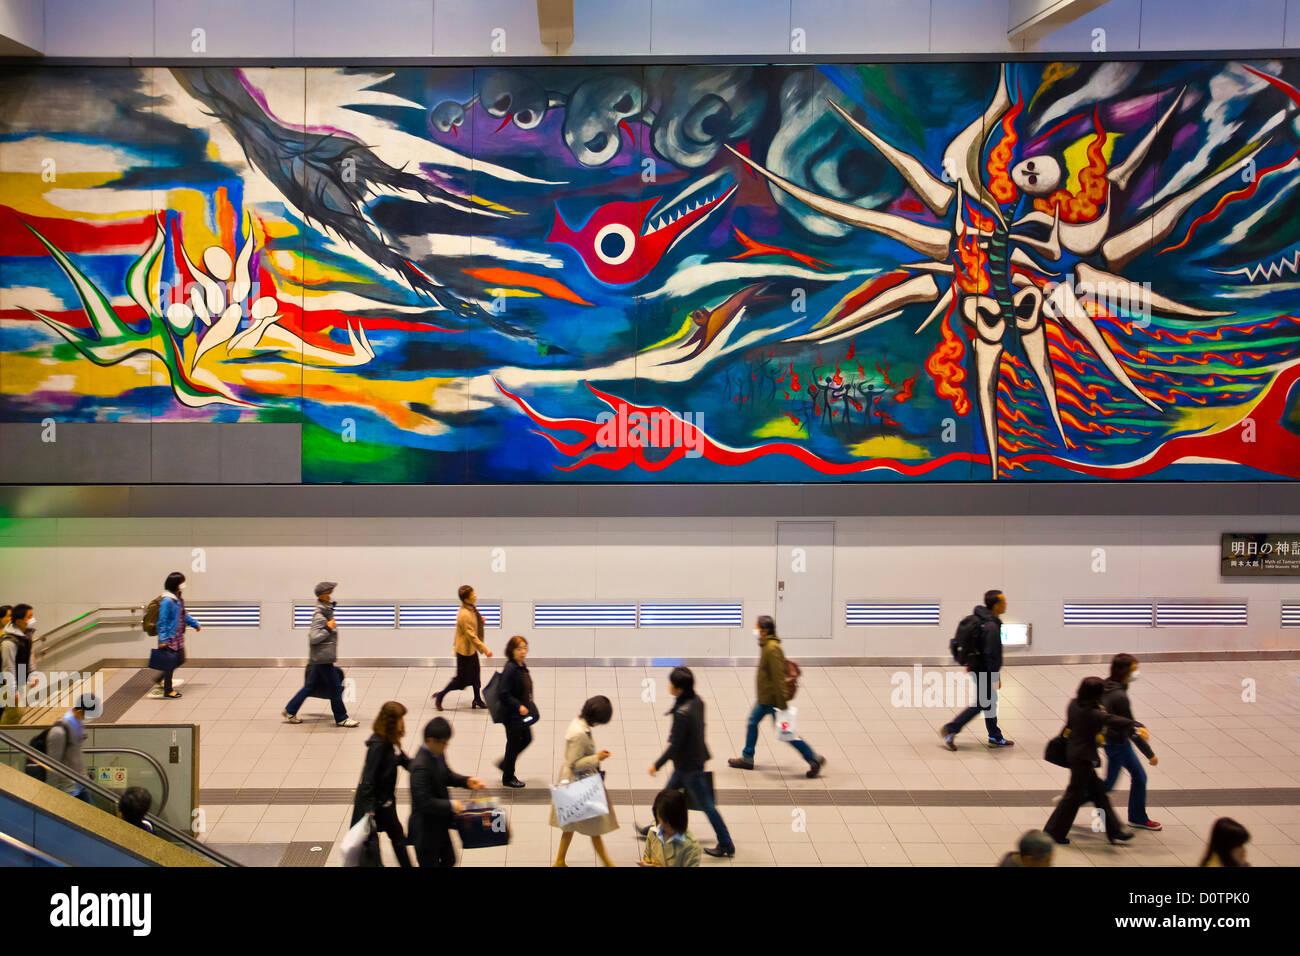 Japan, Asien, Urlaub, Reisen, Tokio, City, Shibuya, Station, Kunst, bunt, Modern, Wandbild, Malerei, Halle, Transfer Stockbild